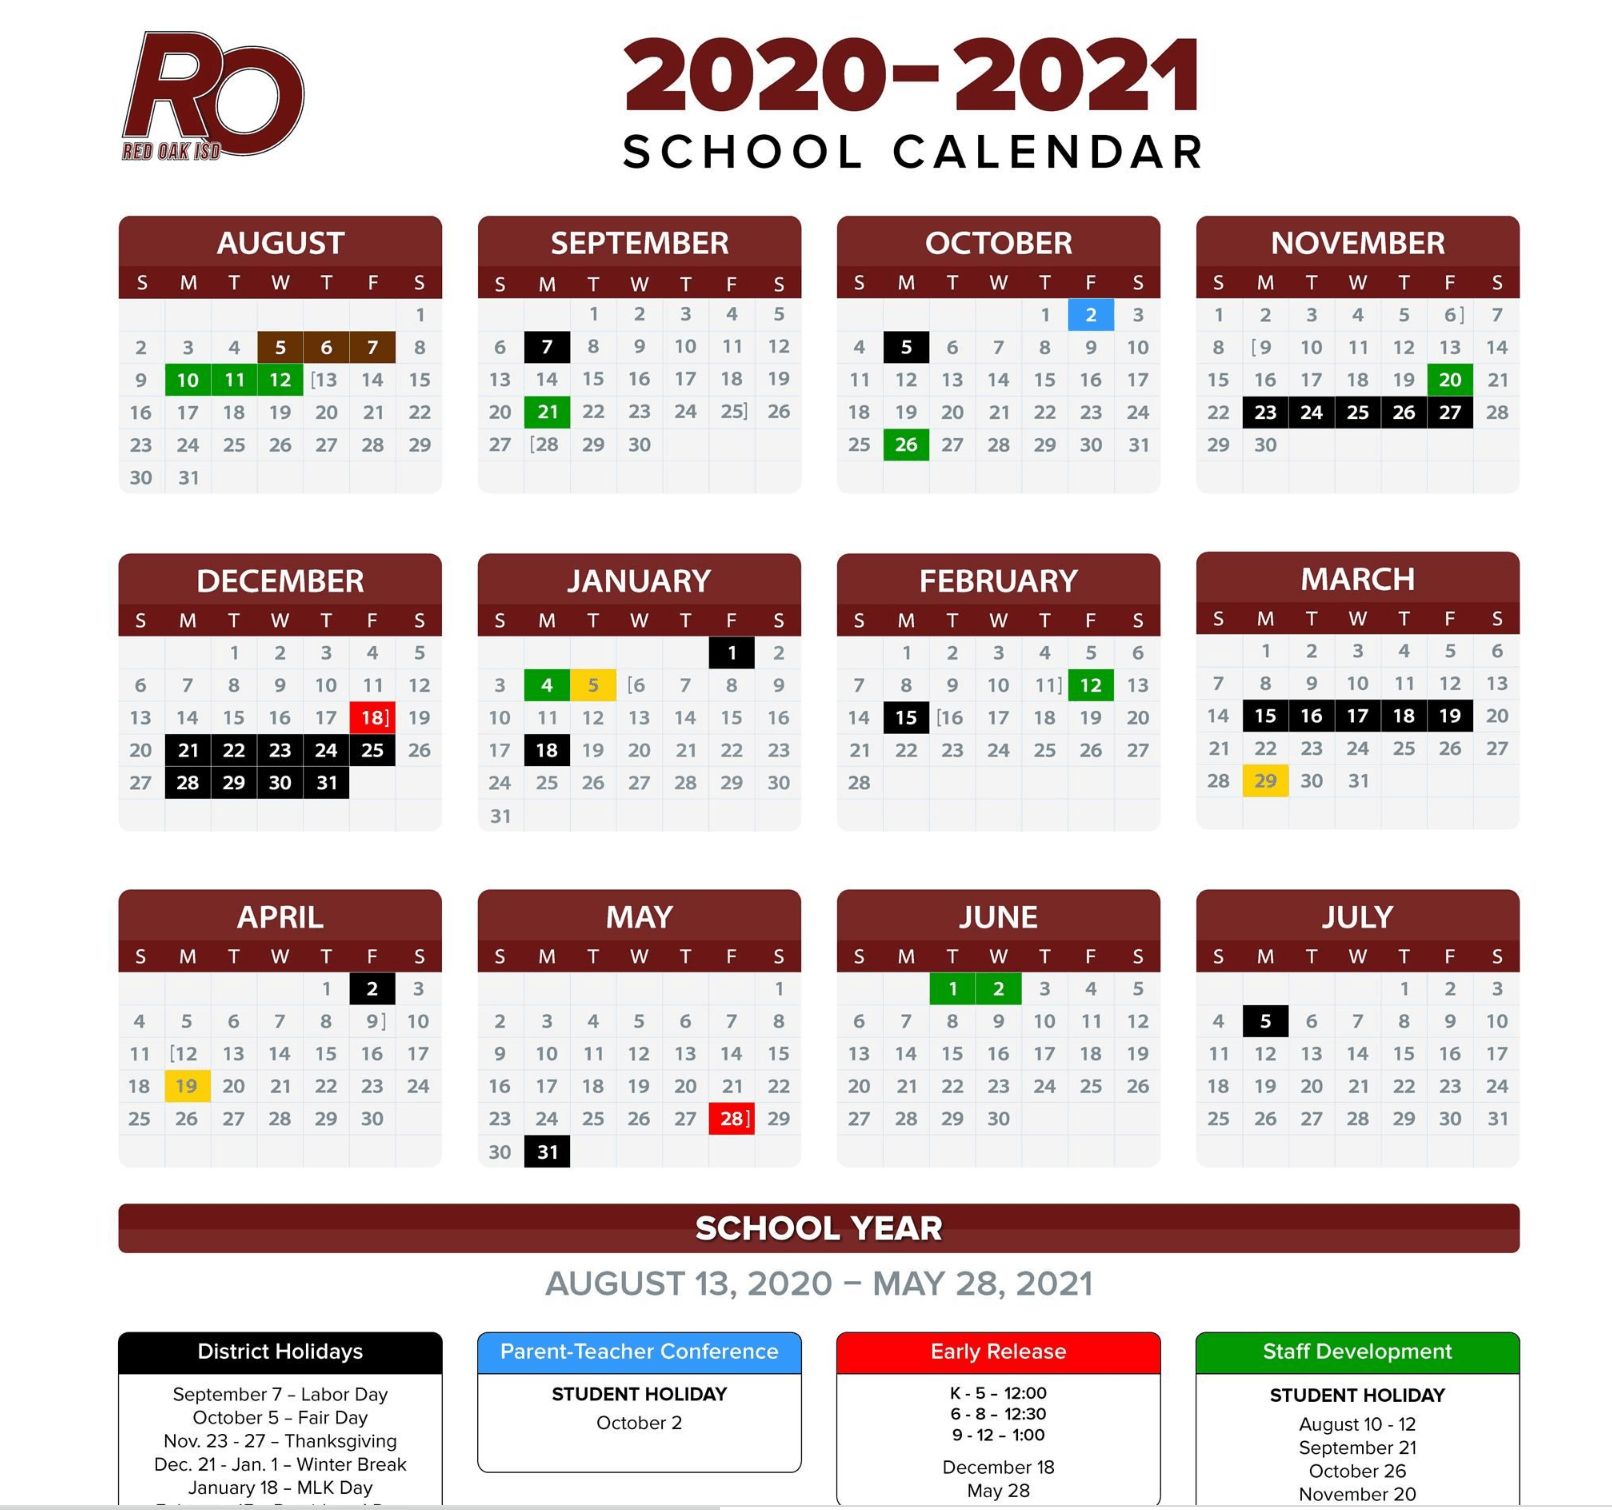 ROISD 2020-2021 calendar